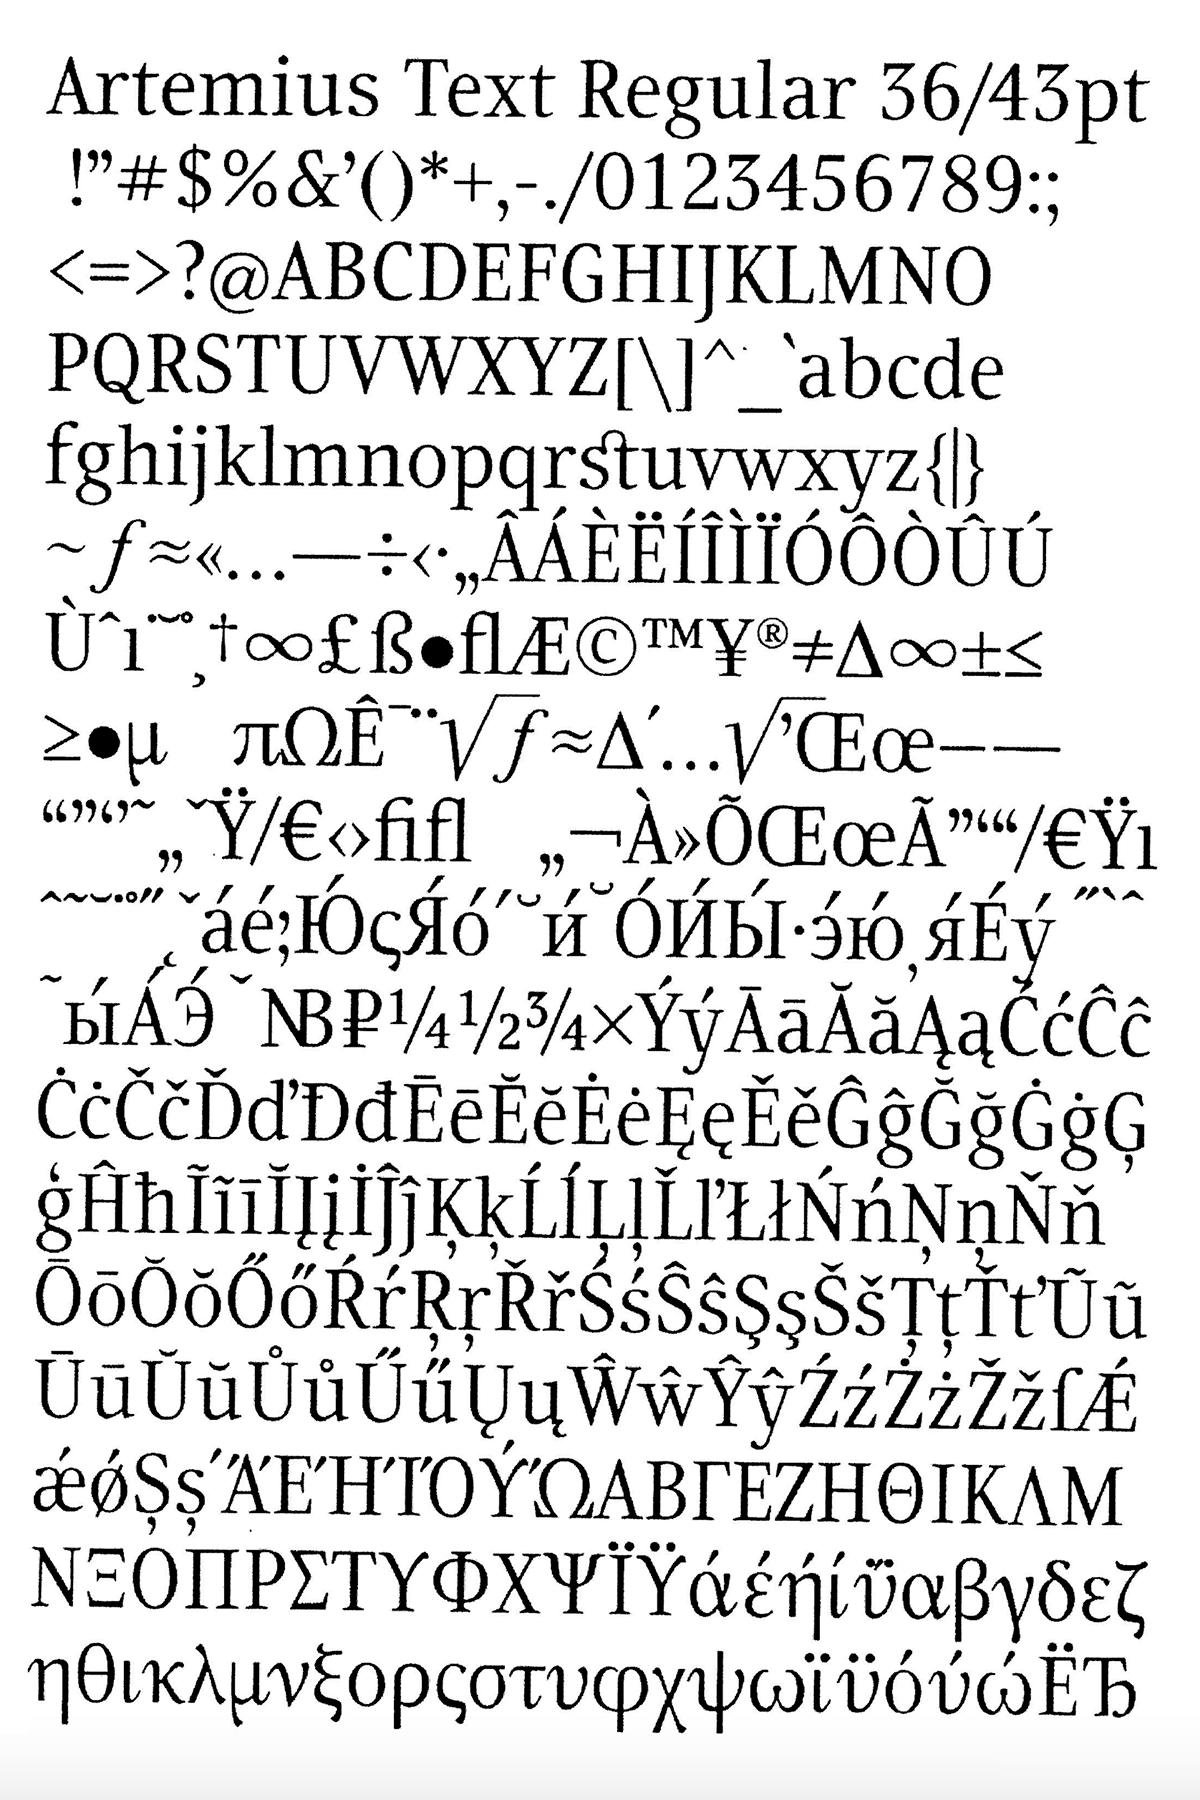 Артемий Лебедев запатентовал шрифт «Артемиус» еще в 2012 году